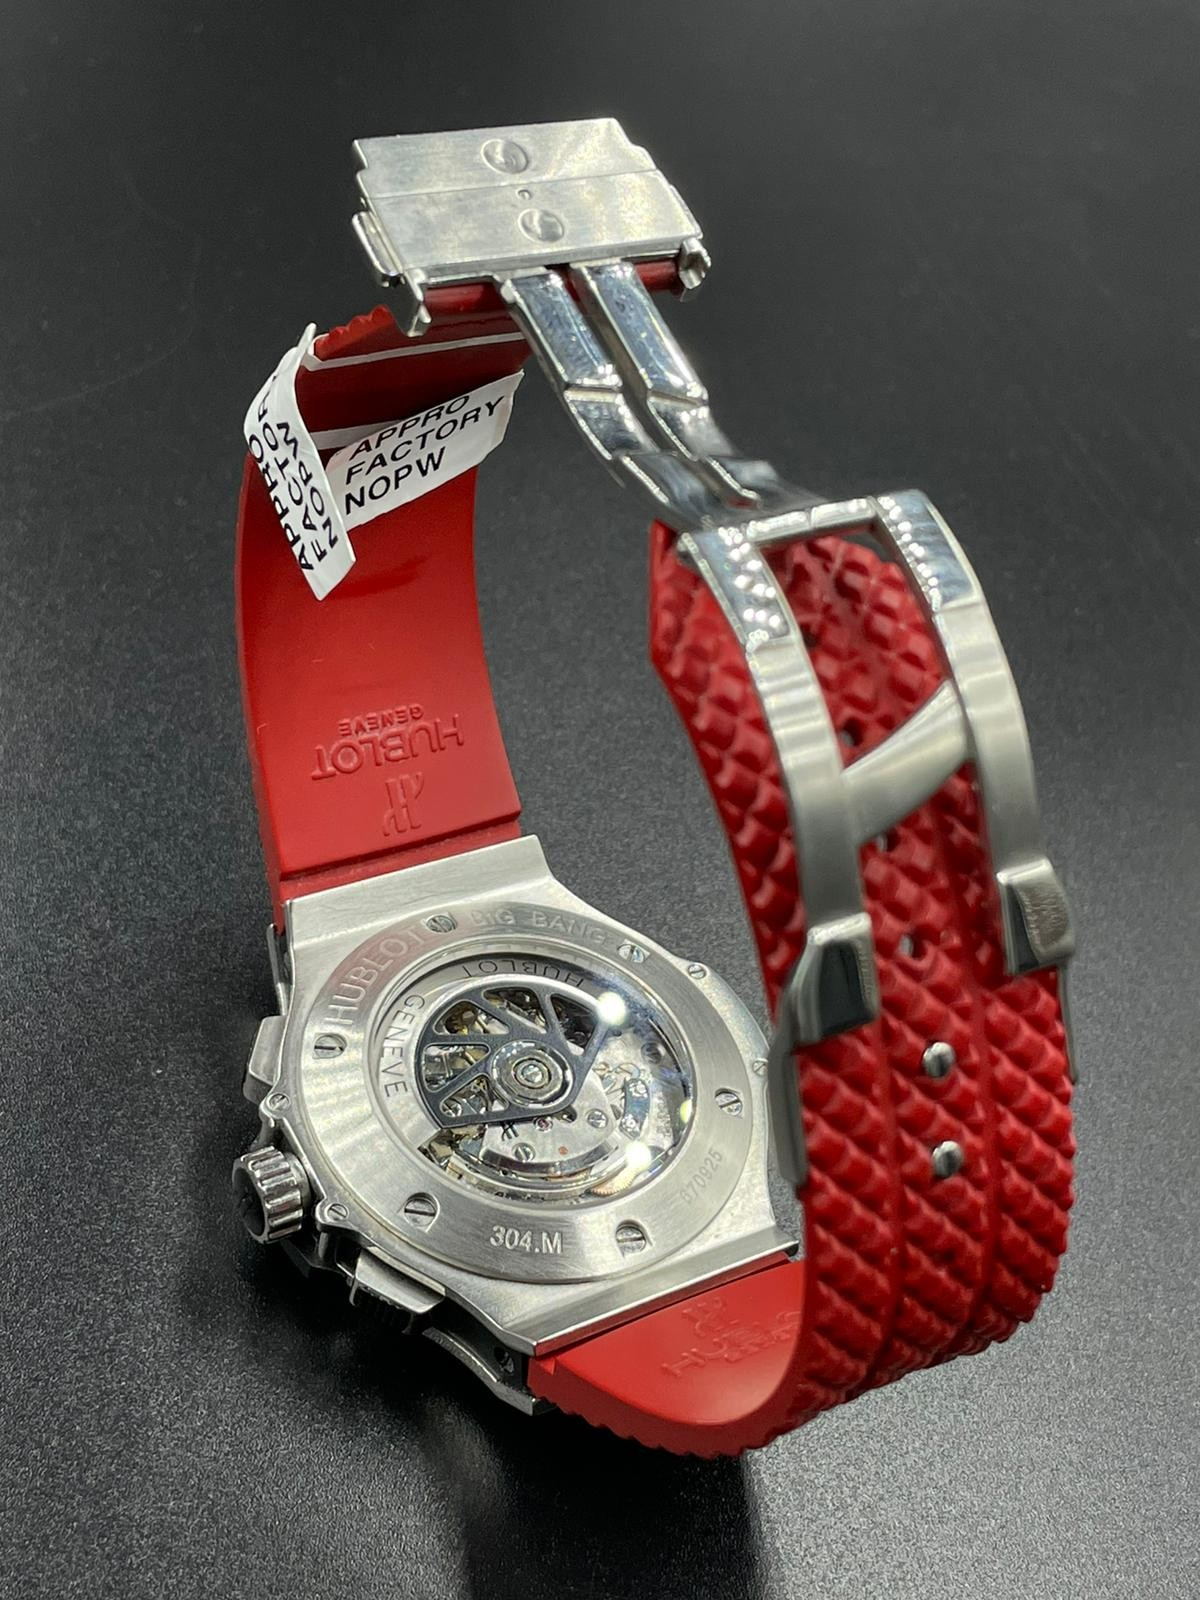 Hublot Big Bang chronometer watch with black face and original diamond dial - Image 3 of 5